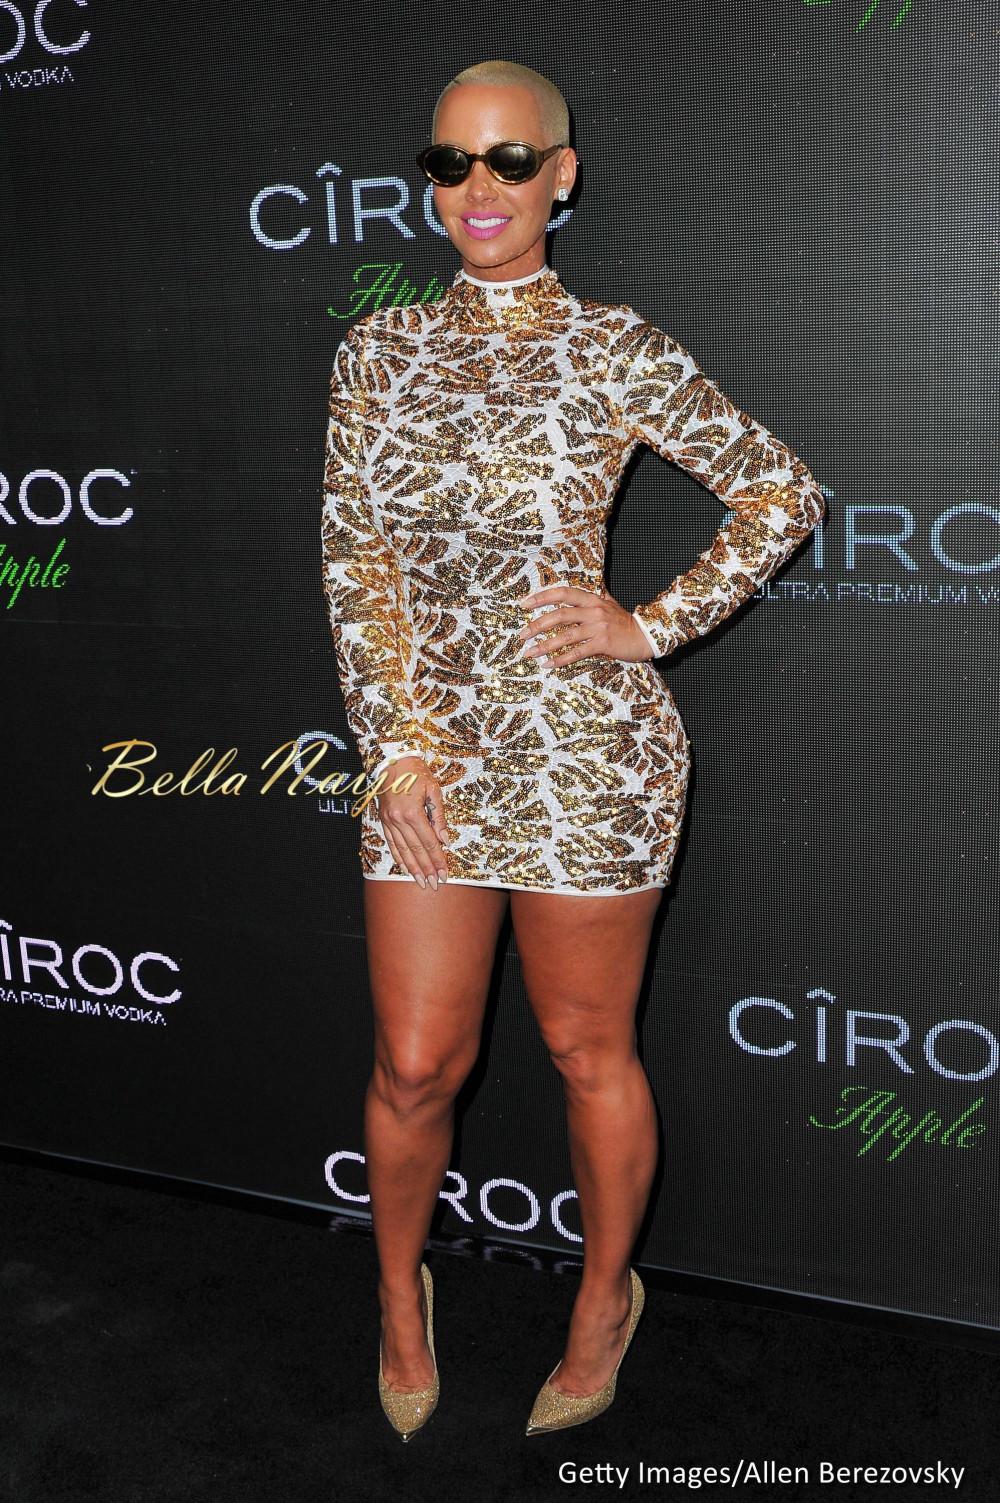 Keke Palmer, Kourtney Kardashian, Kris Jenner, Tyga & More